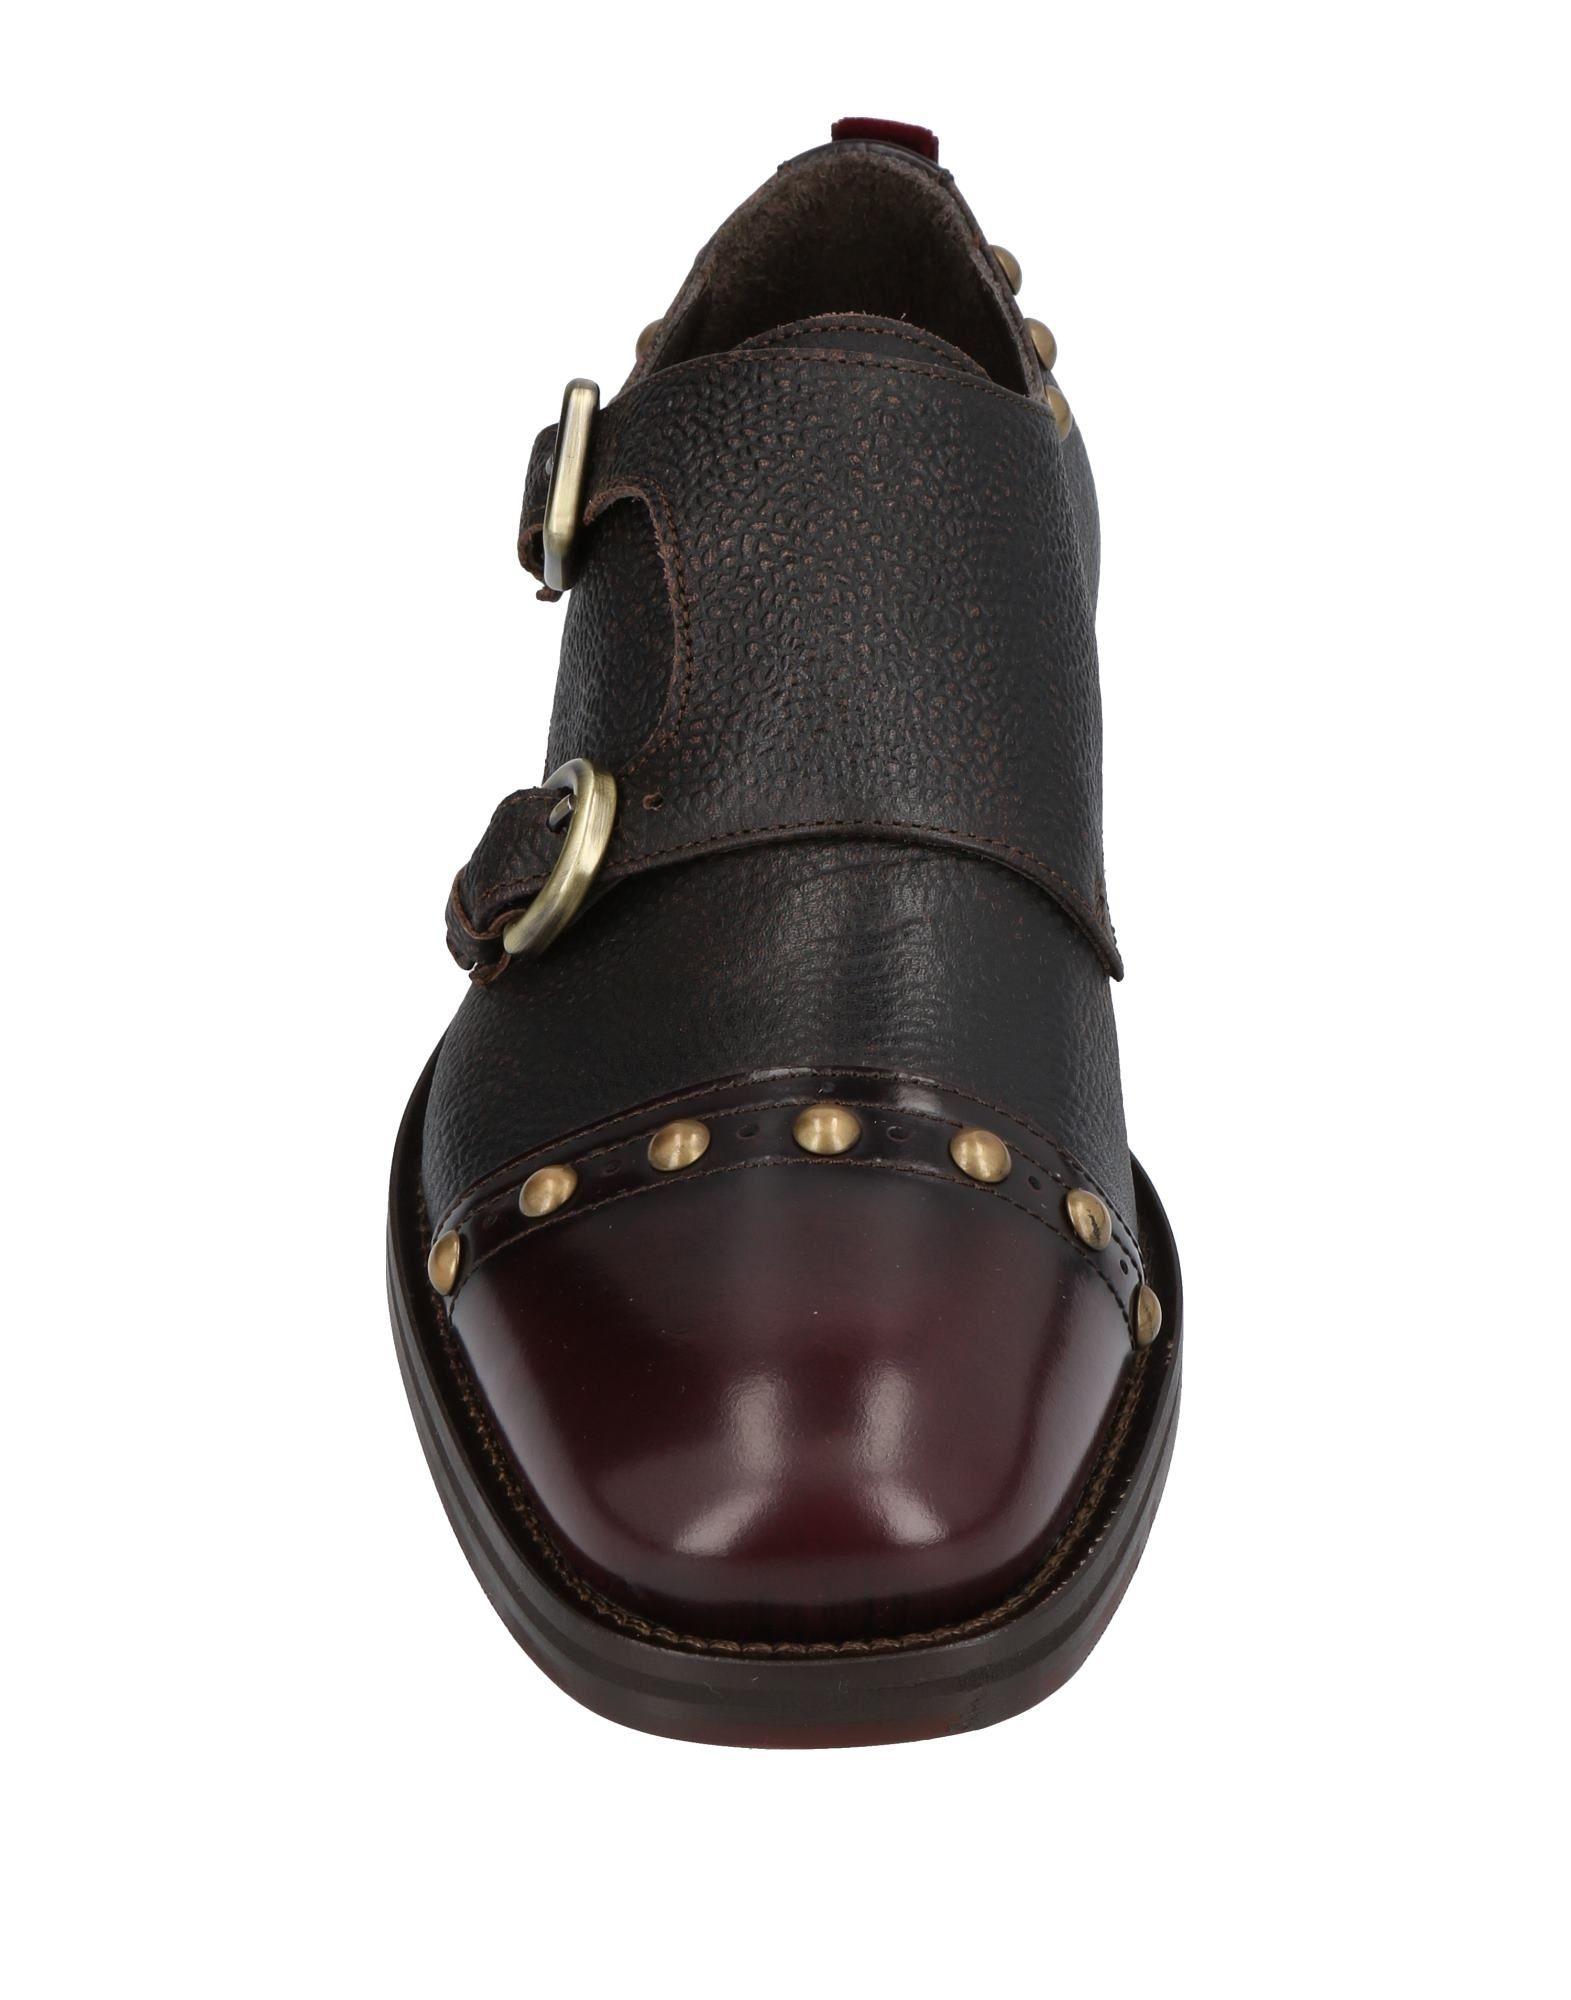 Attimonelli's 11448068VV Mokassins Herren  11448068VV Attimonelli's Gute Qualität beliebte Schuhe 299572